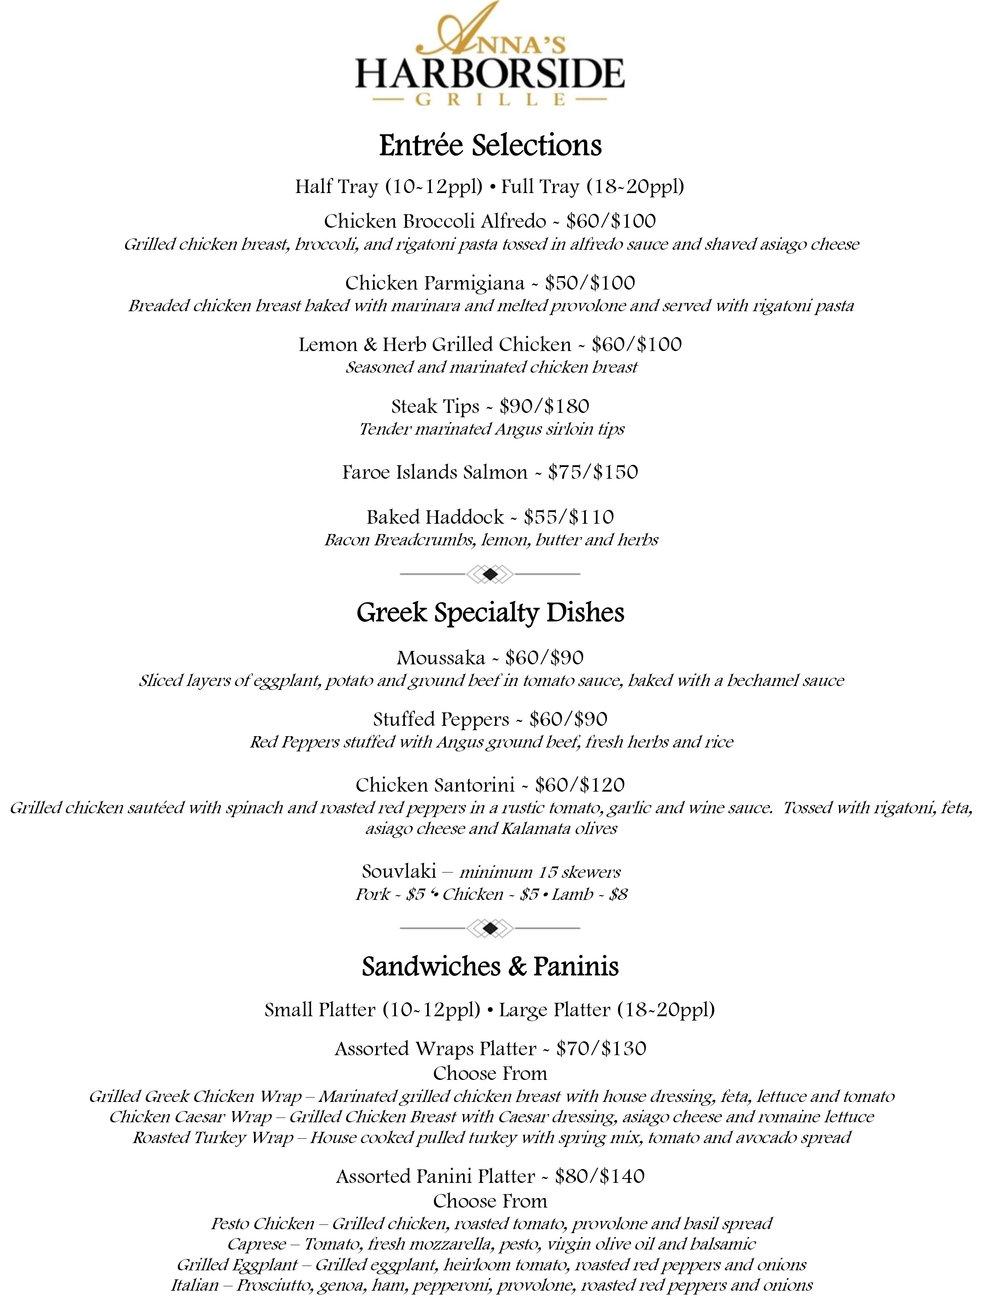 Catering Menu October 2018[6584]-2 - Copy.jpg